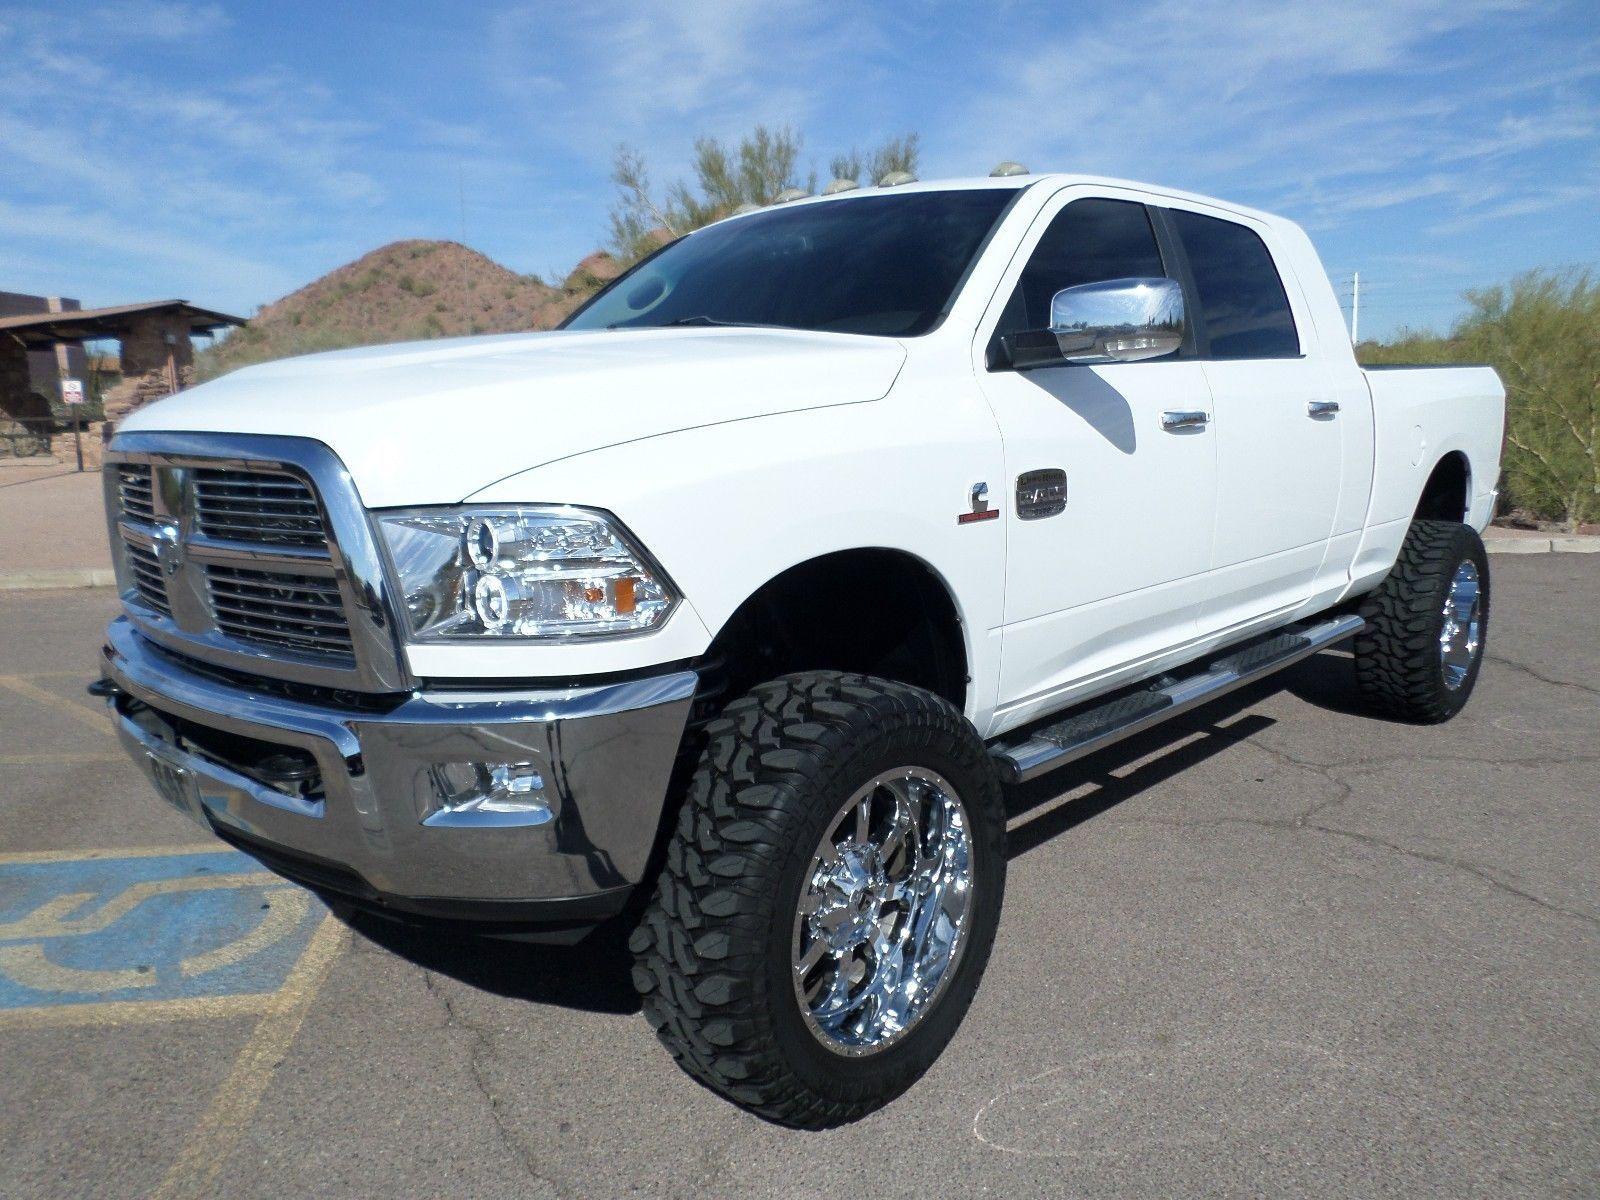 Loaded 2011 Dodge Ram 2500 Laramie Lifted Diesel Trucks Chevy Diesel Trucks Dodge Diesel Trucks